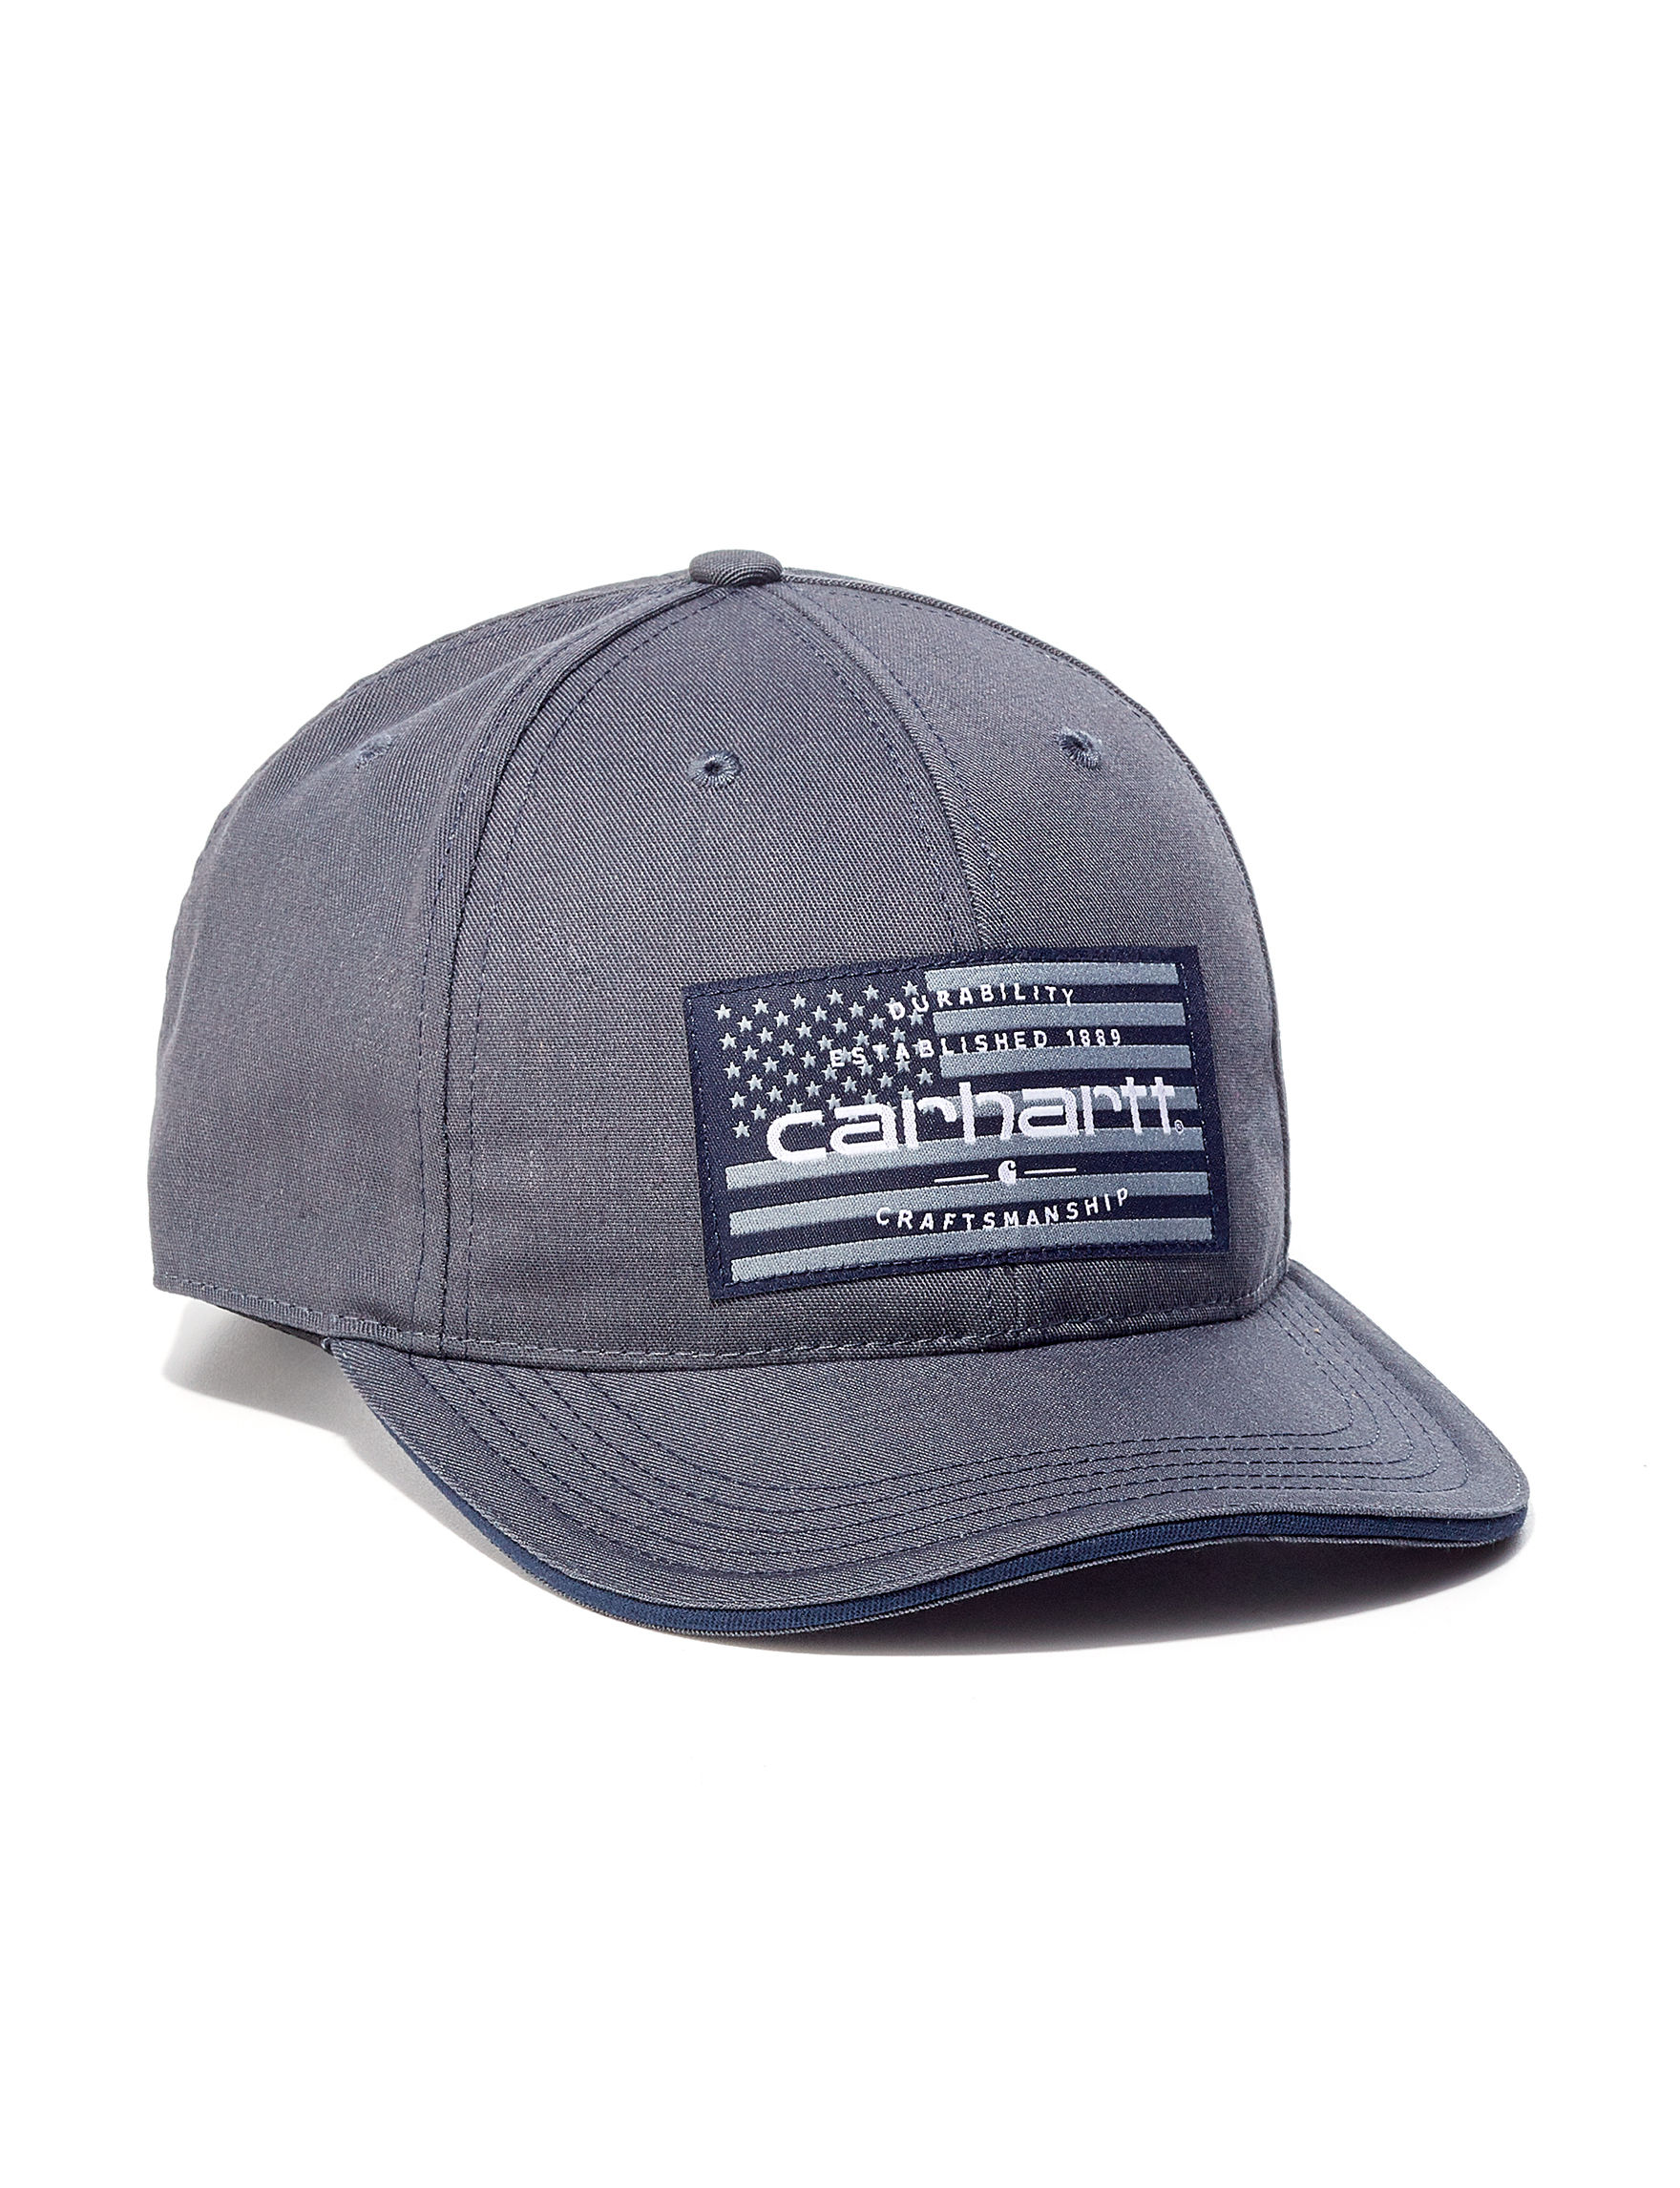 Carhartt Dark Grey Hats & Headwear